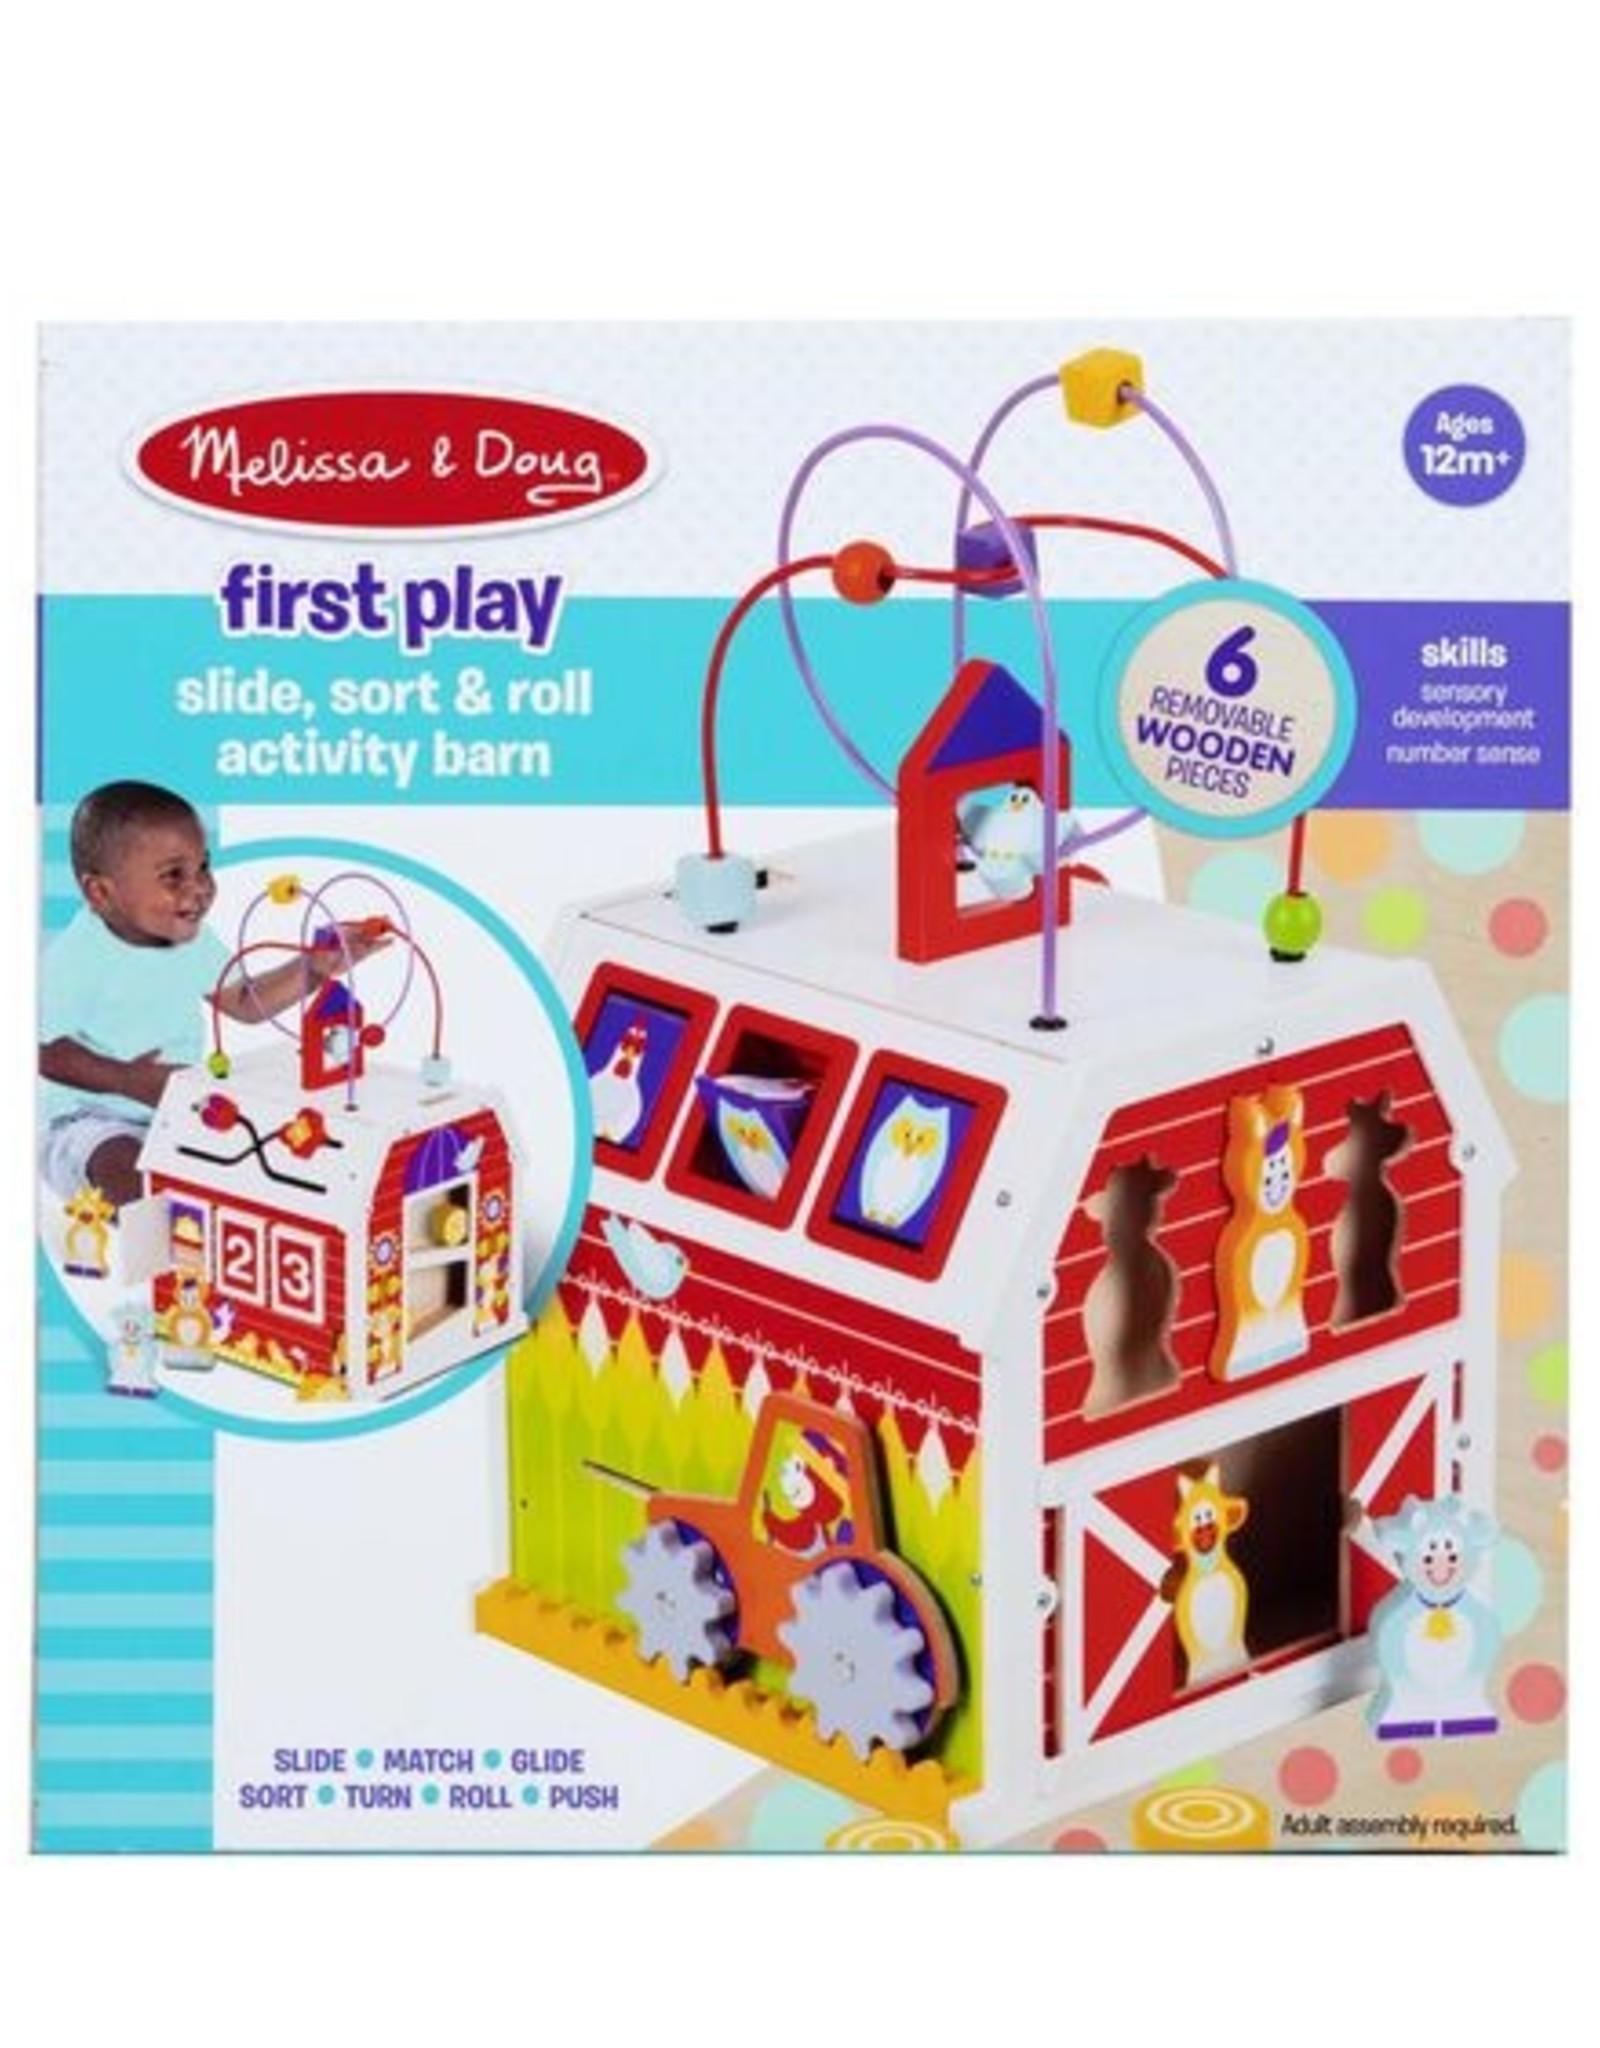 Melissa & Doug First Play Slide, Sort & Roll Activity Barn